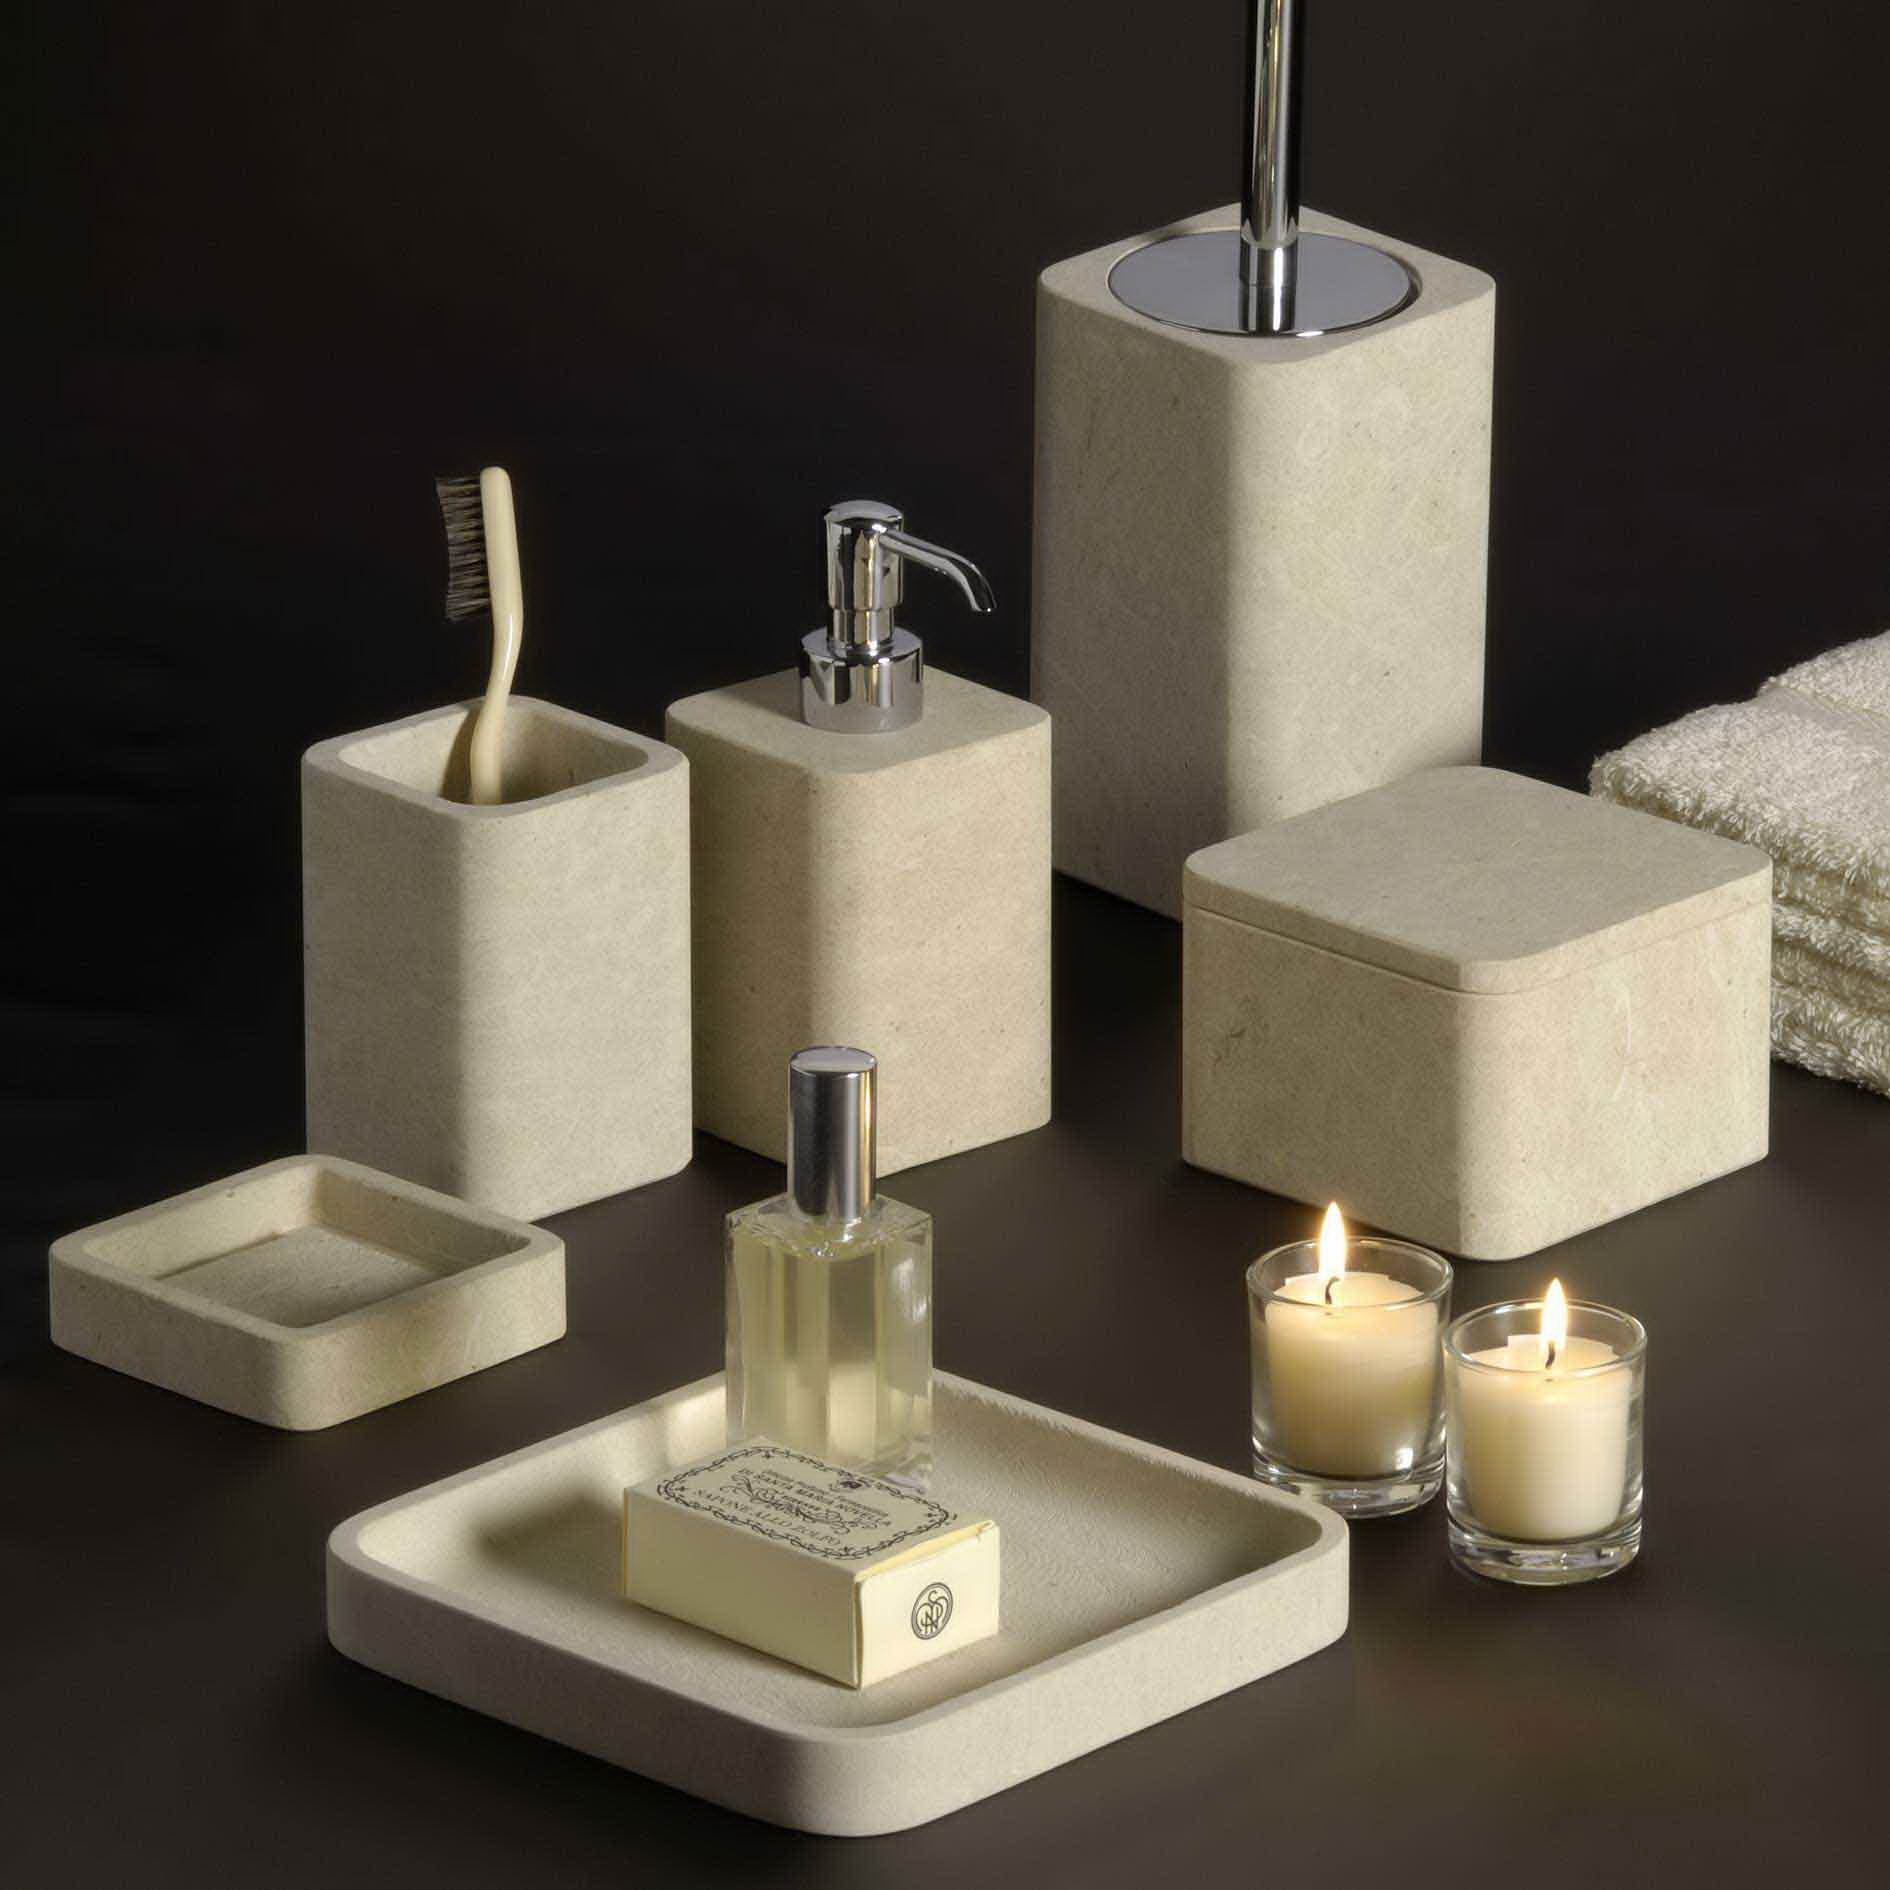 Ustensile de salle de bain 49084 salle de bain id es for Accessoires de salle de bain en tunisie